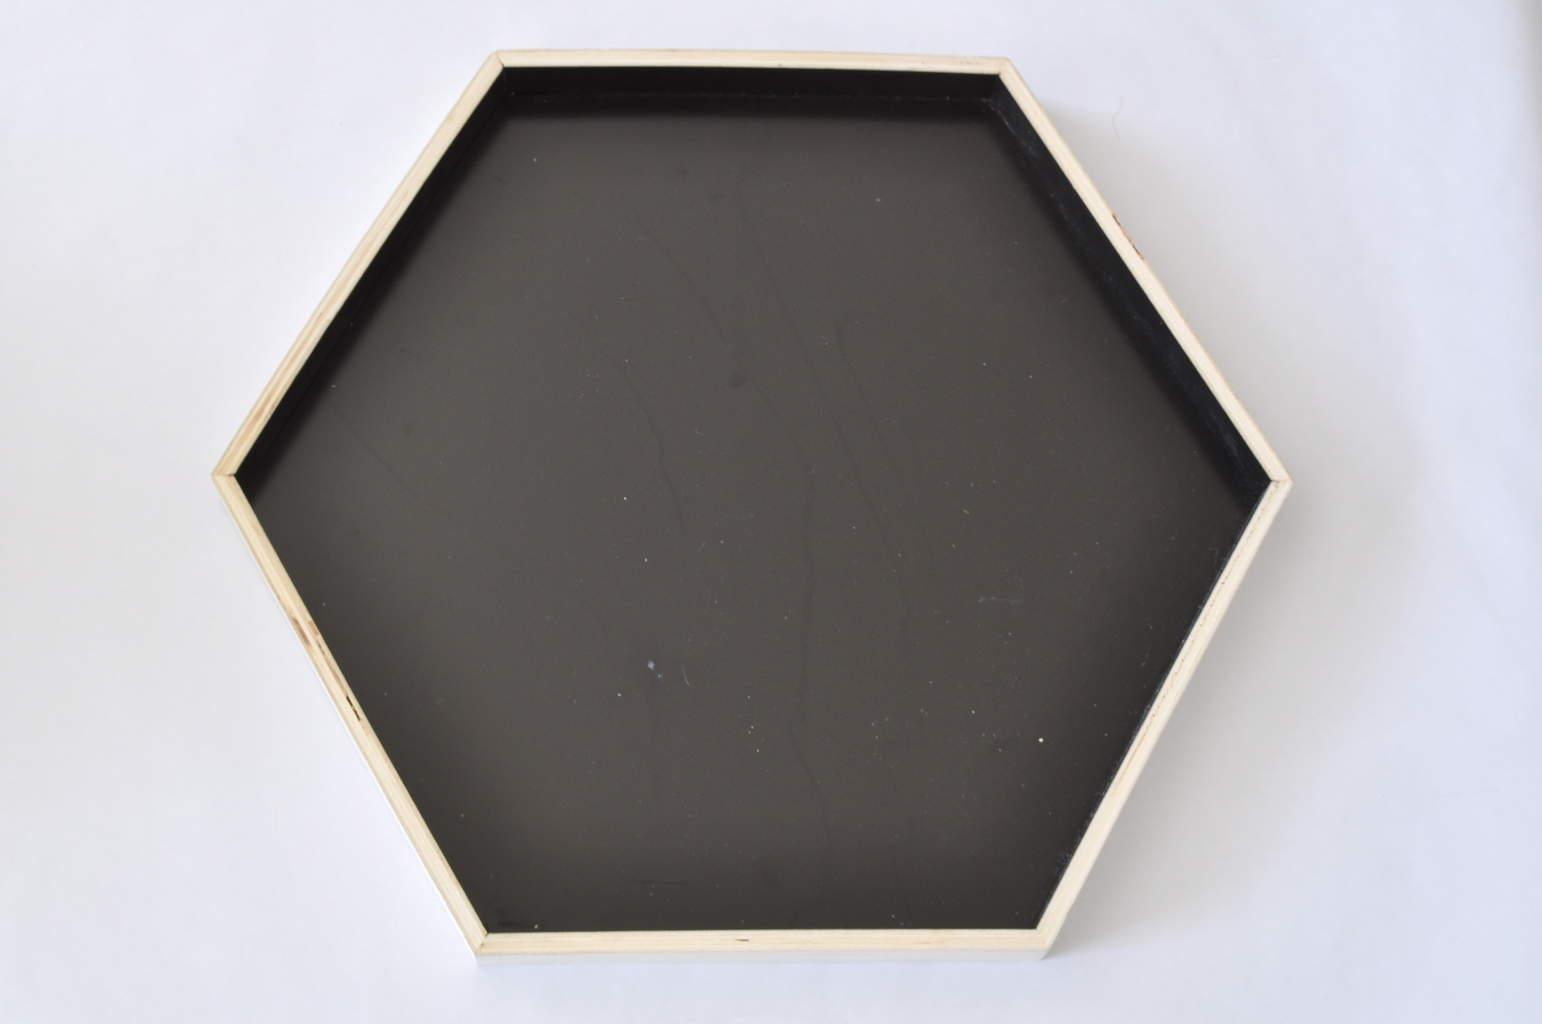 Geometric tray repurposed to cute sign